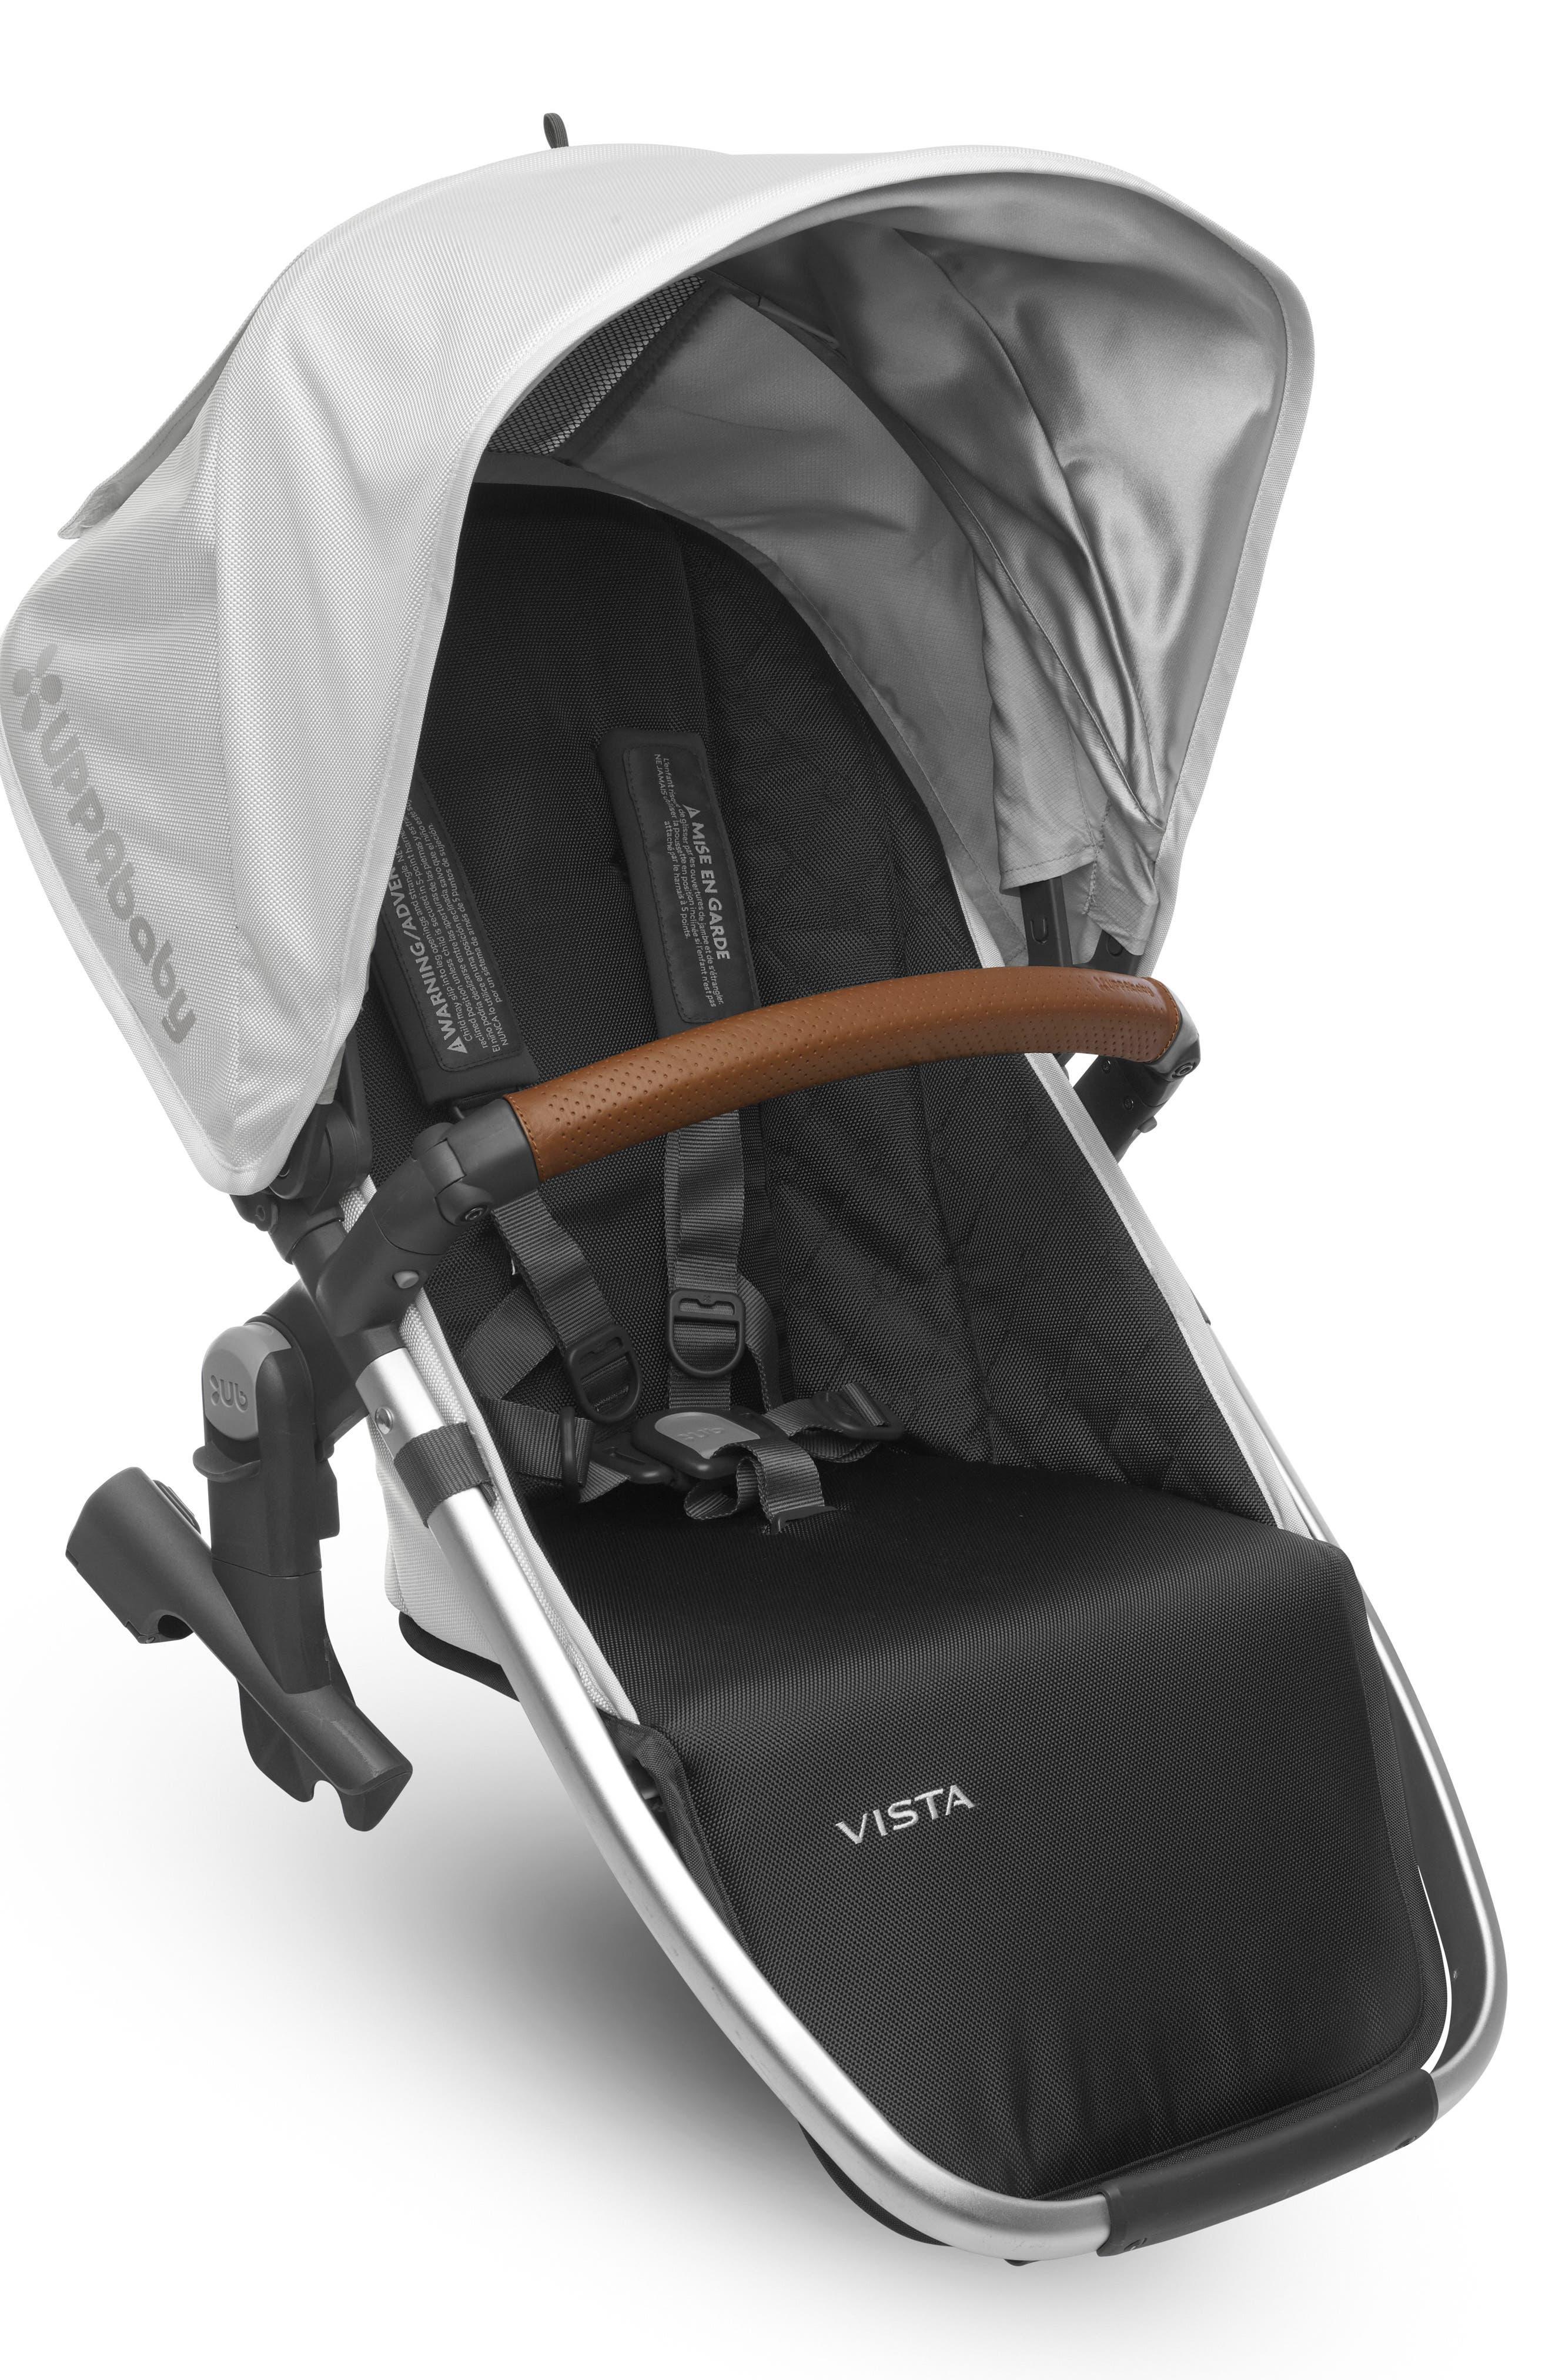 VISTA Stroller Rumble Seat,                         Main,                         color, White/ Silver